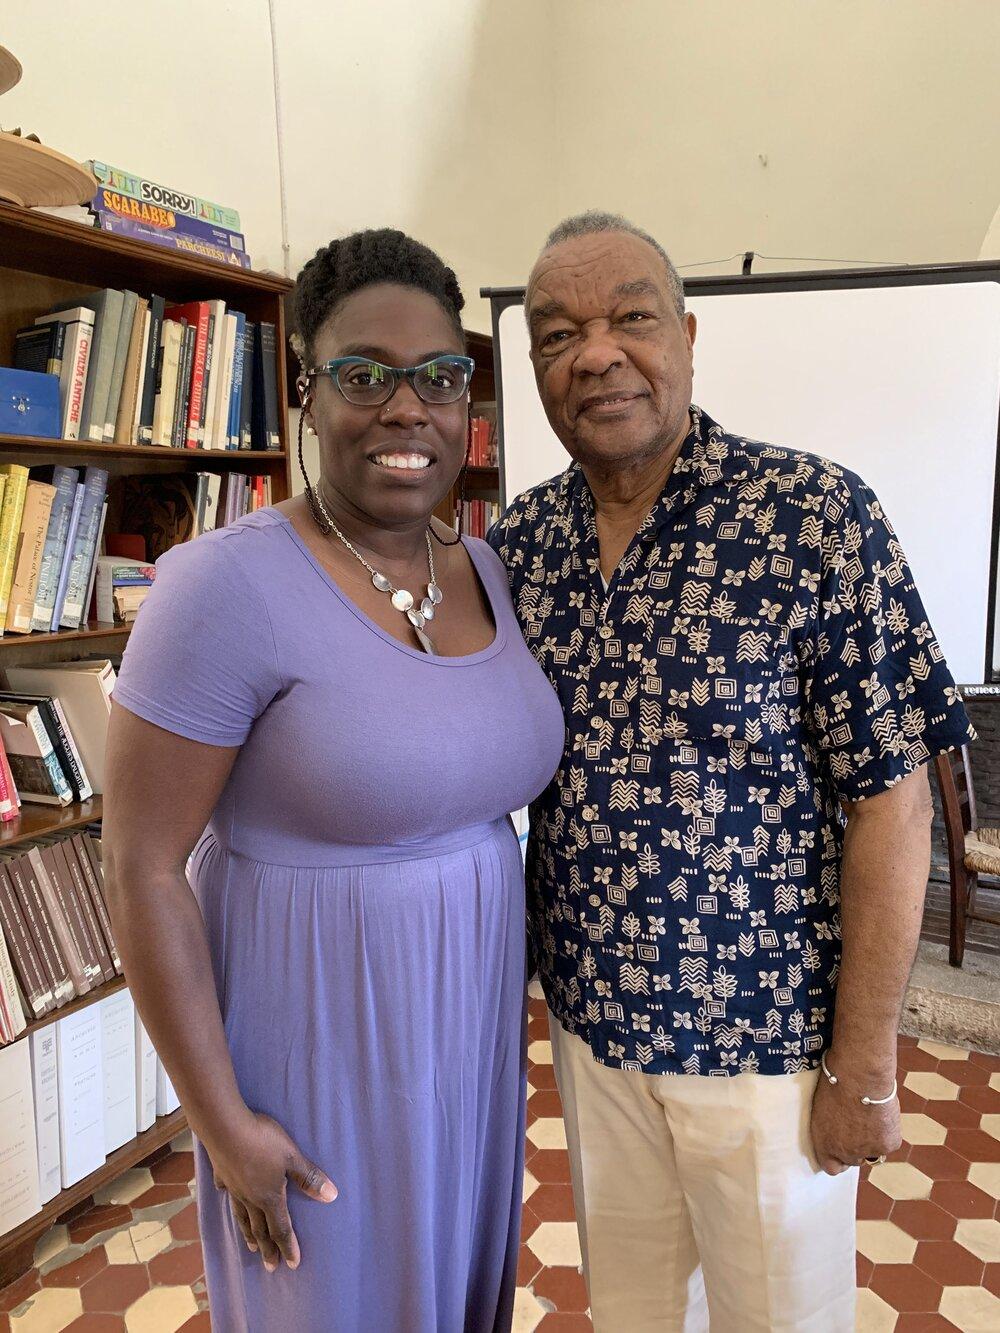 Kimberly Wade with David C. Driskell at Spannocchia. June 2019. Photo courtesy of Kimberly Wade